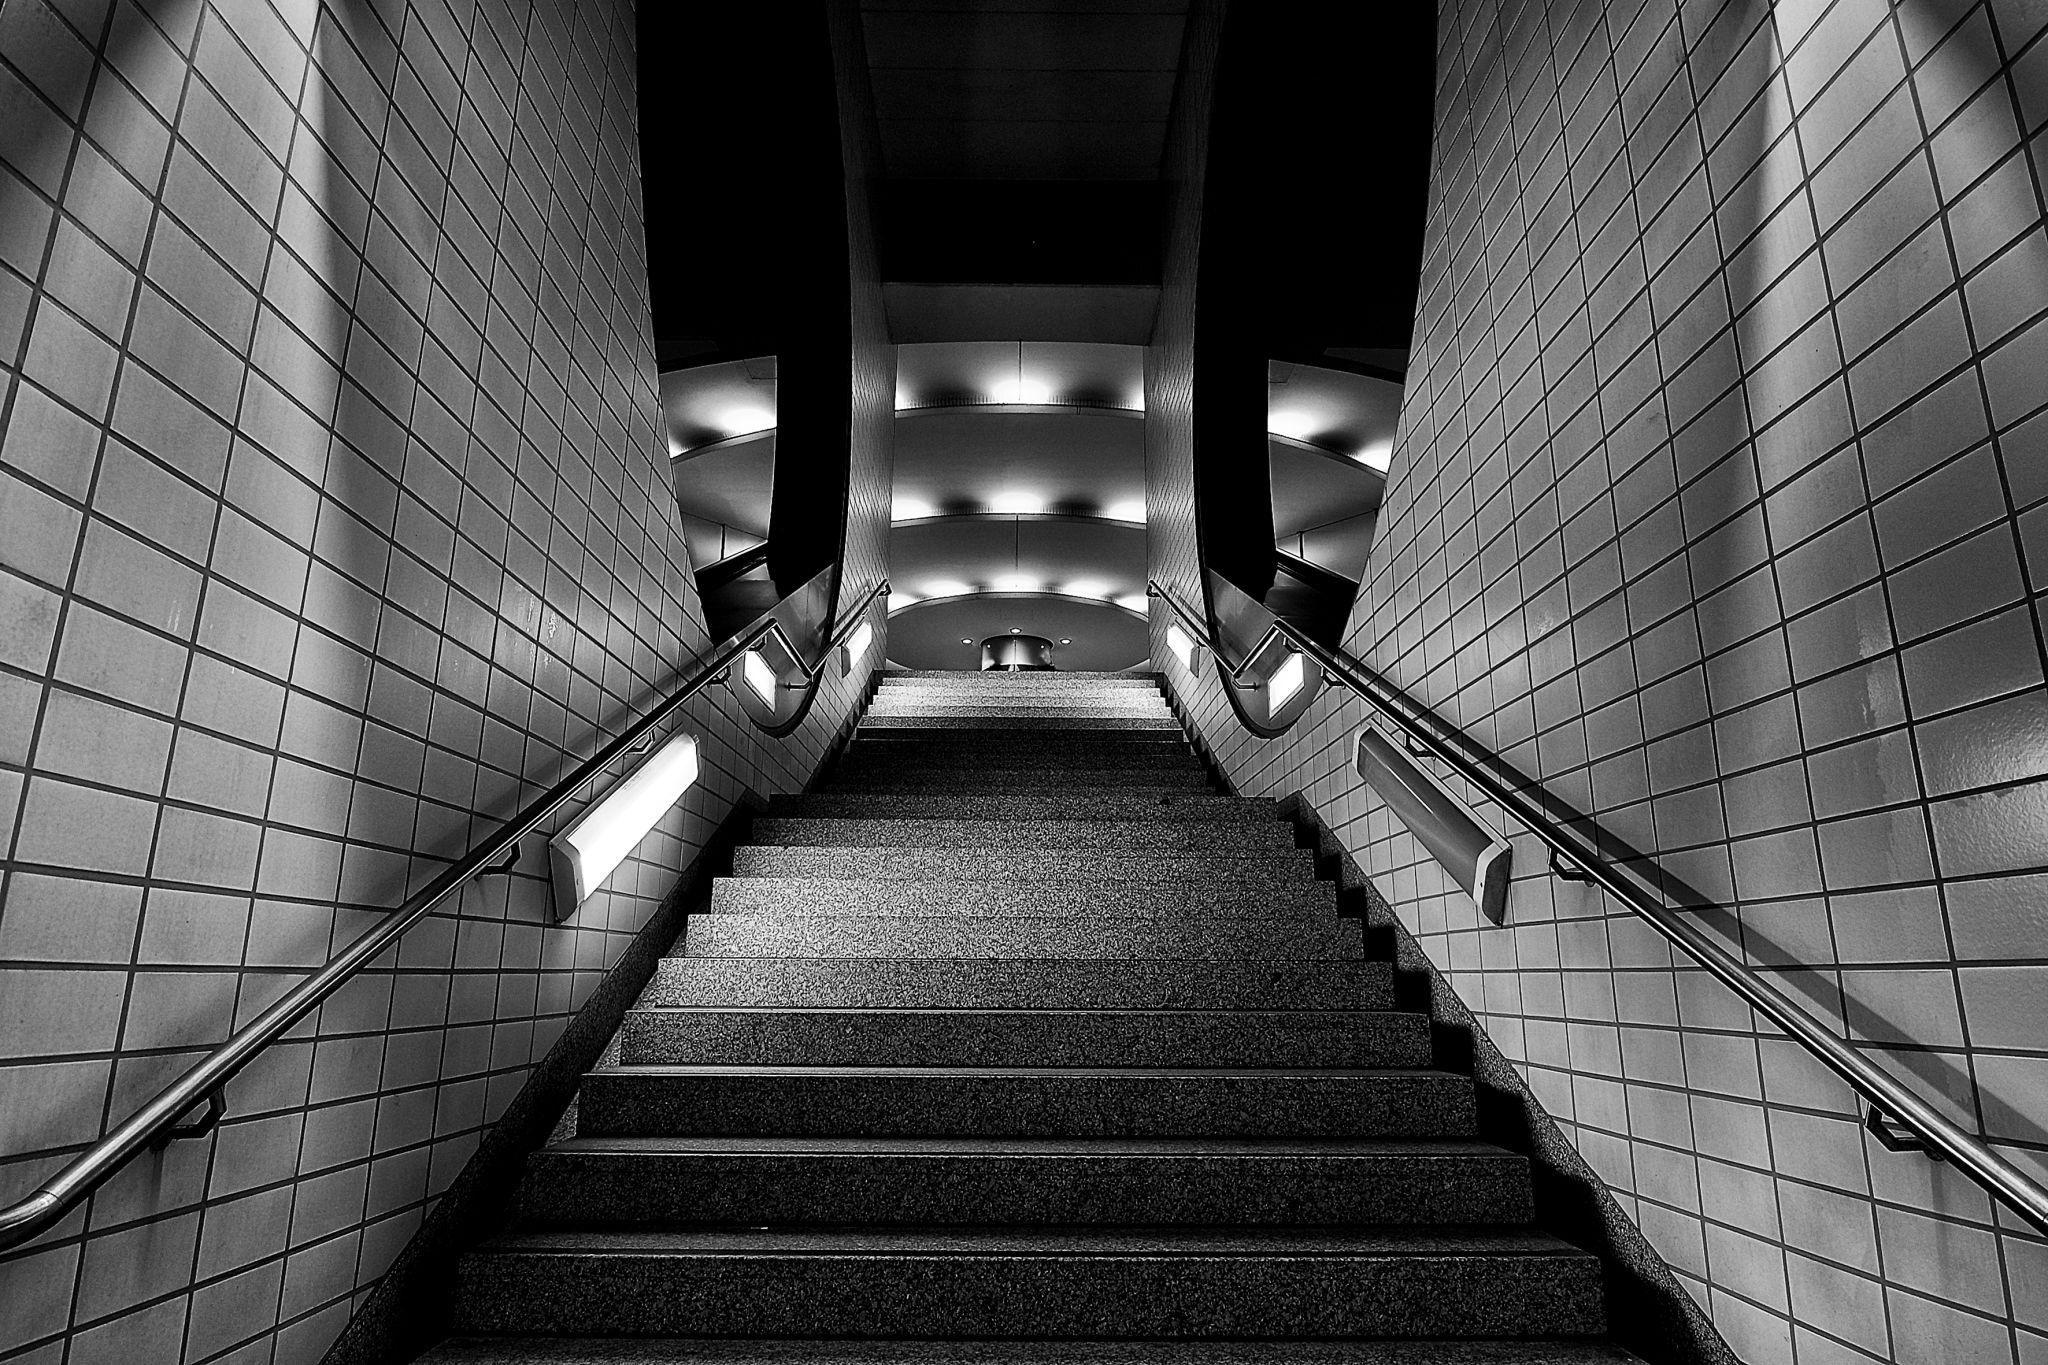 Frankfurt U-Bahnstation Messe, Germany